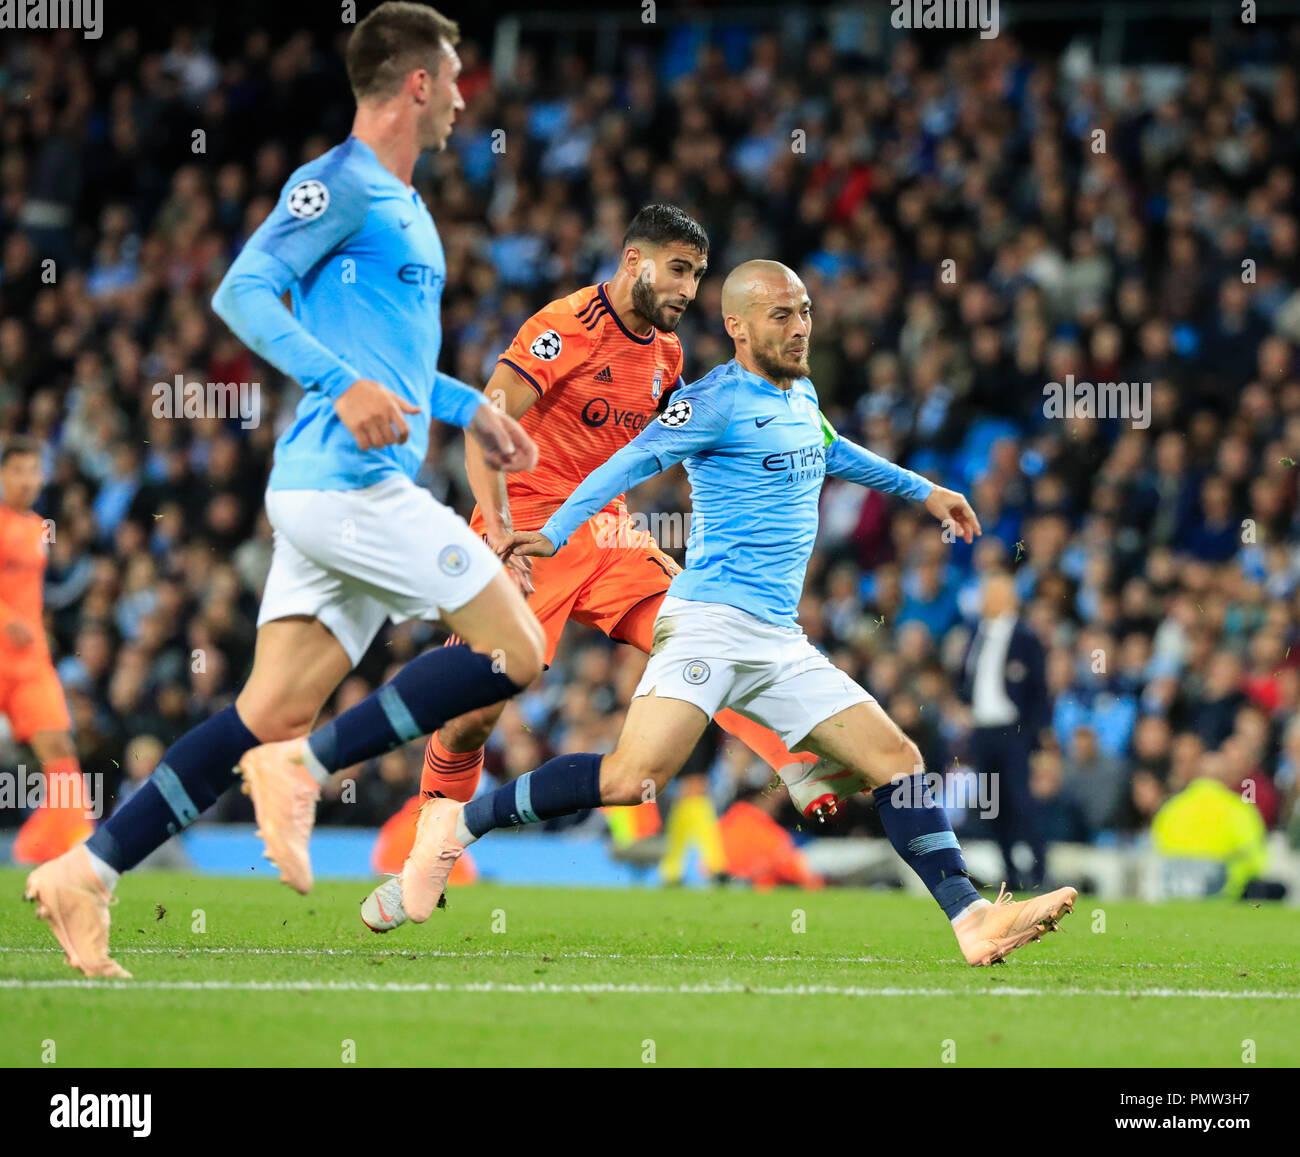 Etihad Stadium Manchester Uk 19th Sep 2018 Uefa Champions